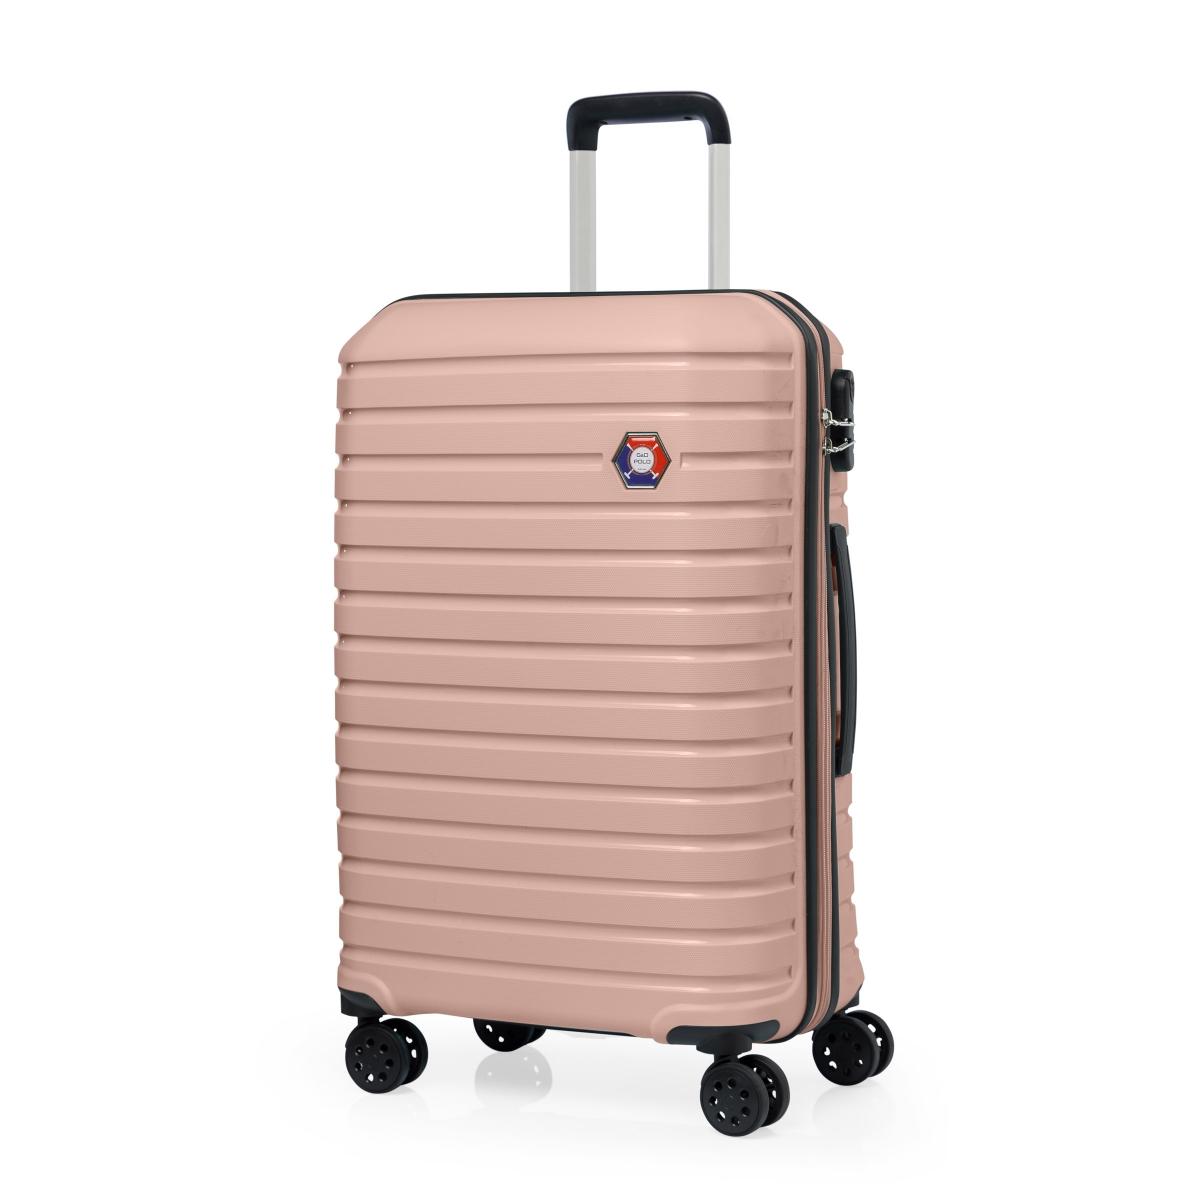 G&D Polo Suitcase PP Enjeksiyon 3'lü Valiz Seyahat Seti - Model 400.17 Somon